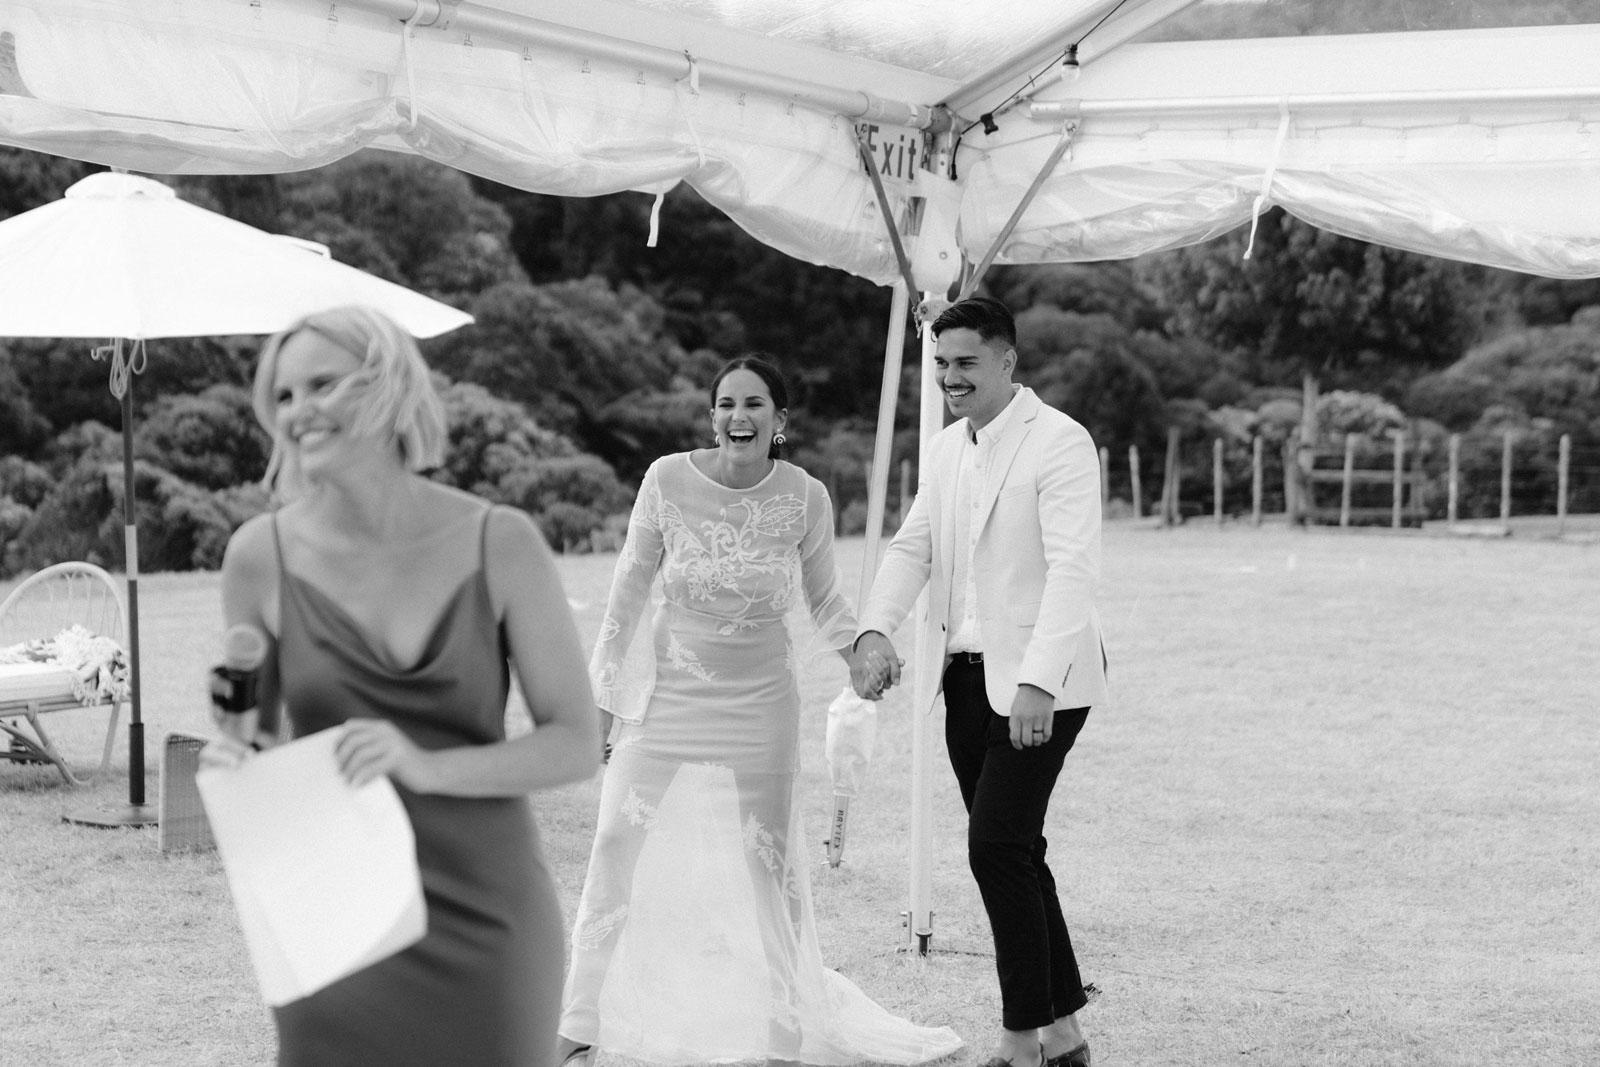 newfound-s-t-hunua-auckland-wedding-photographers-074